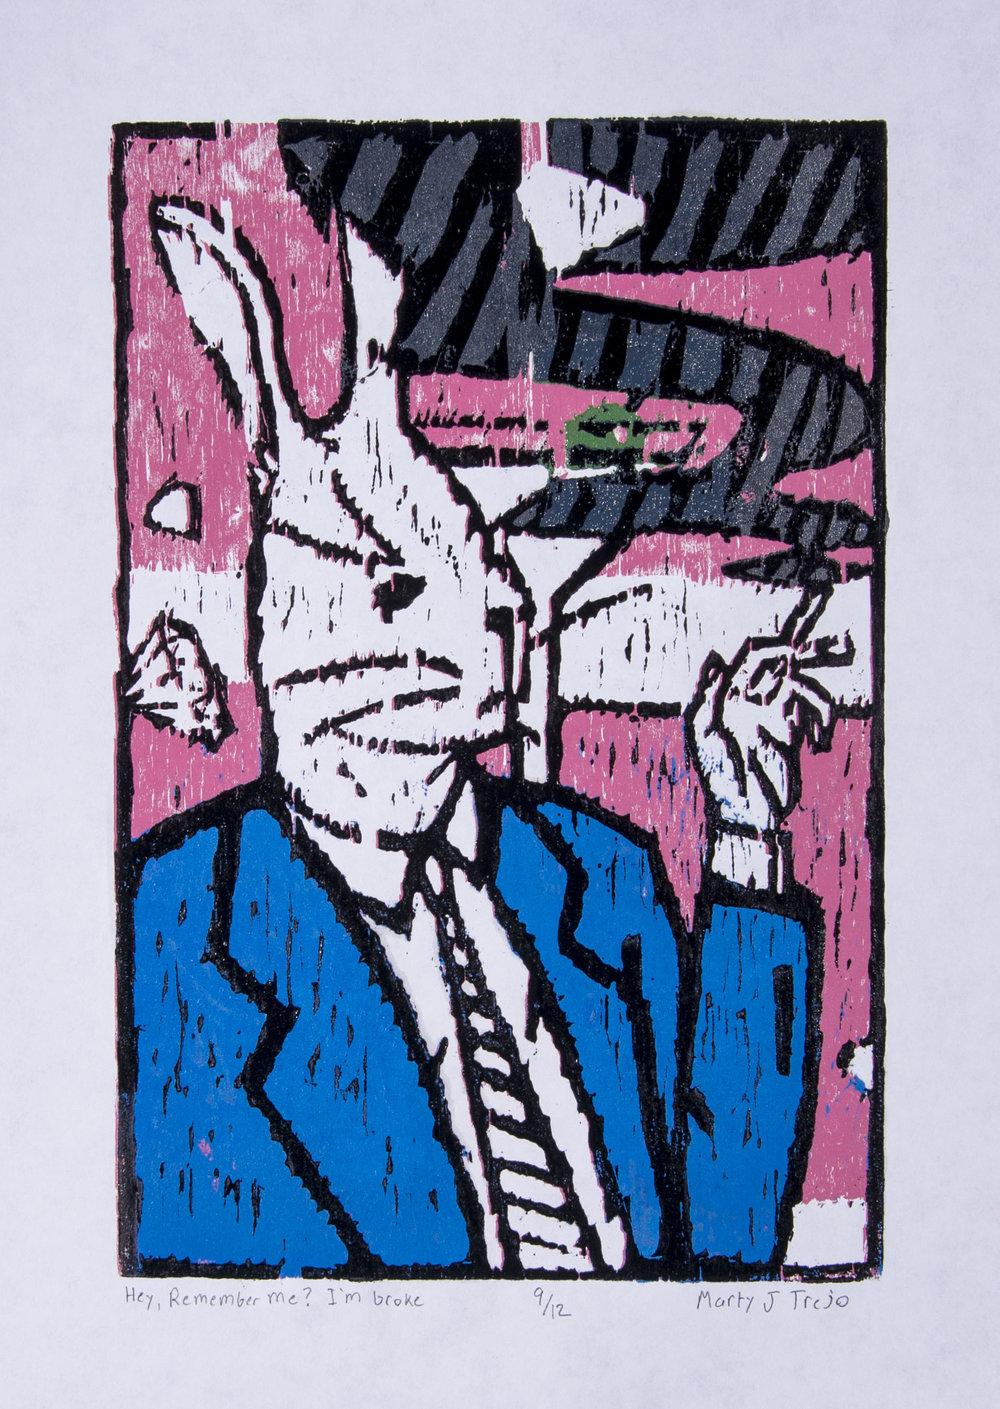 MARTY TREJO  - Lombard, IL   Hey, Remember Me? I'm Broke   reduction woodcut print